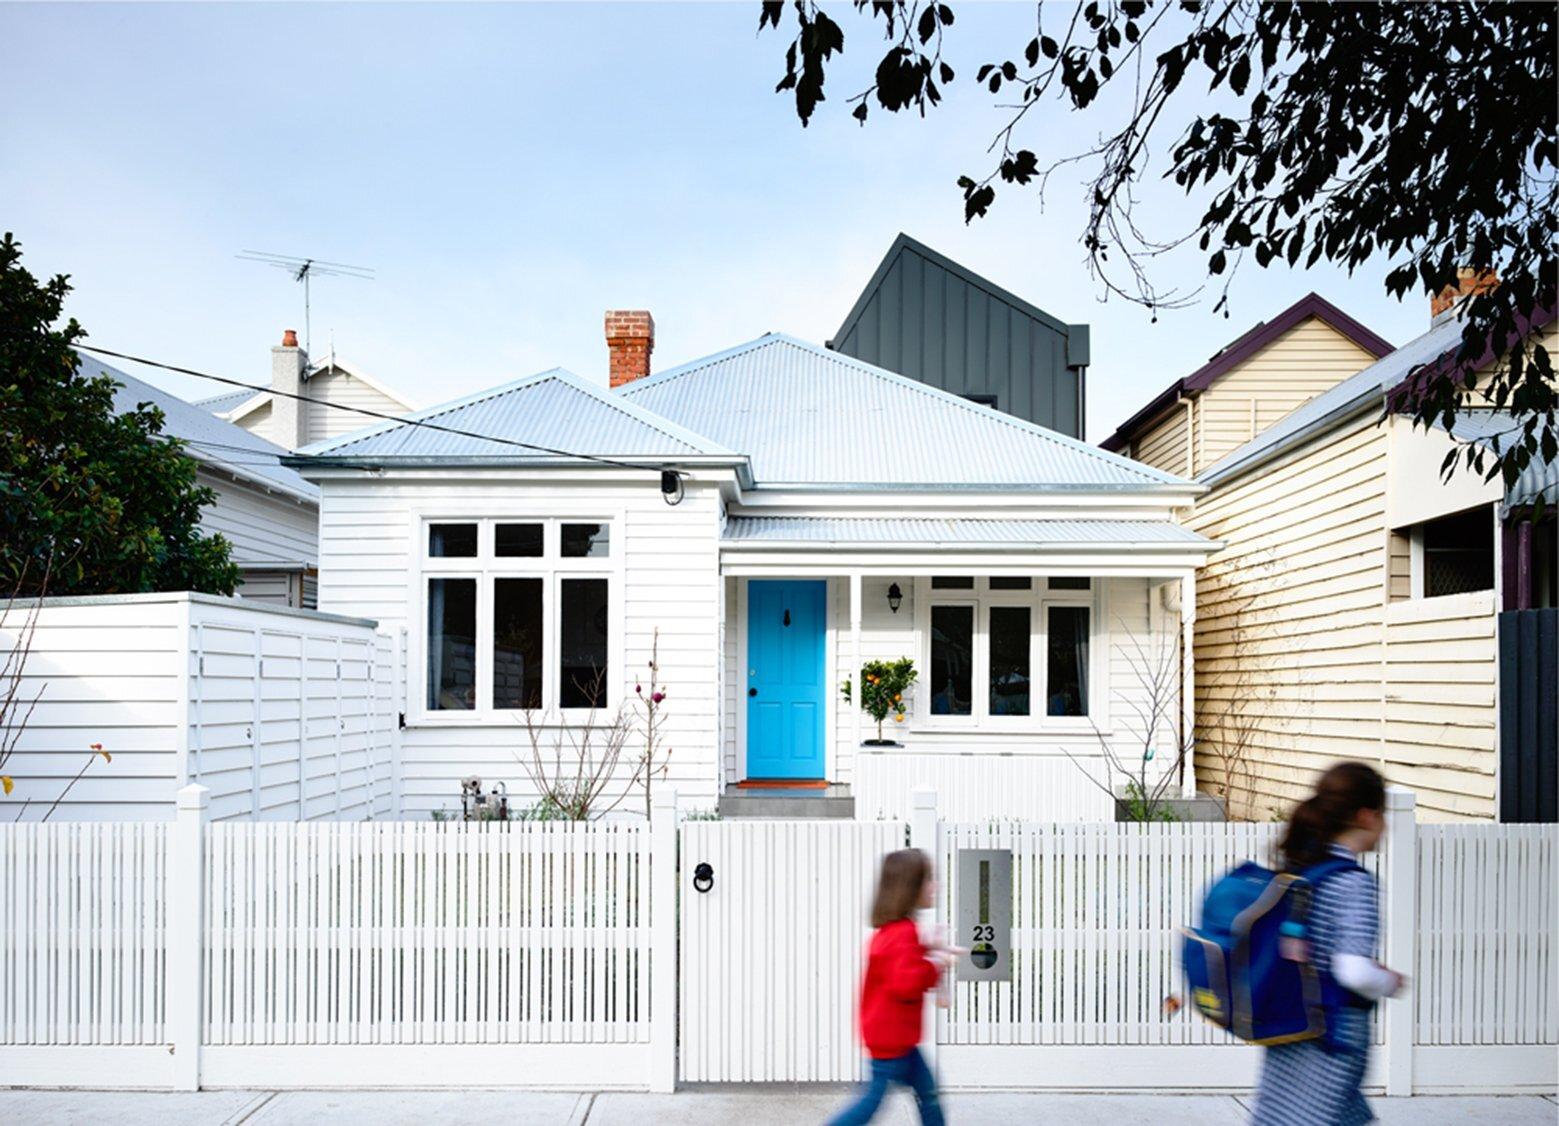 Sandringham House - Small House - Techne Architecture+Interior Design - Doherty Design Studio - Australia - Exterior - Humble Homes